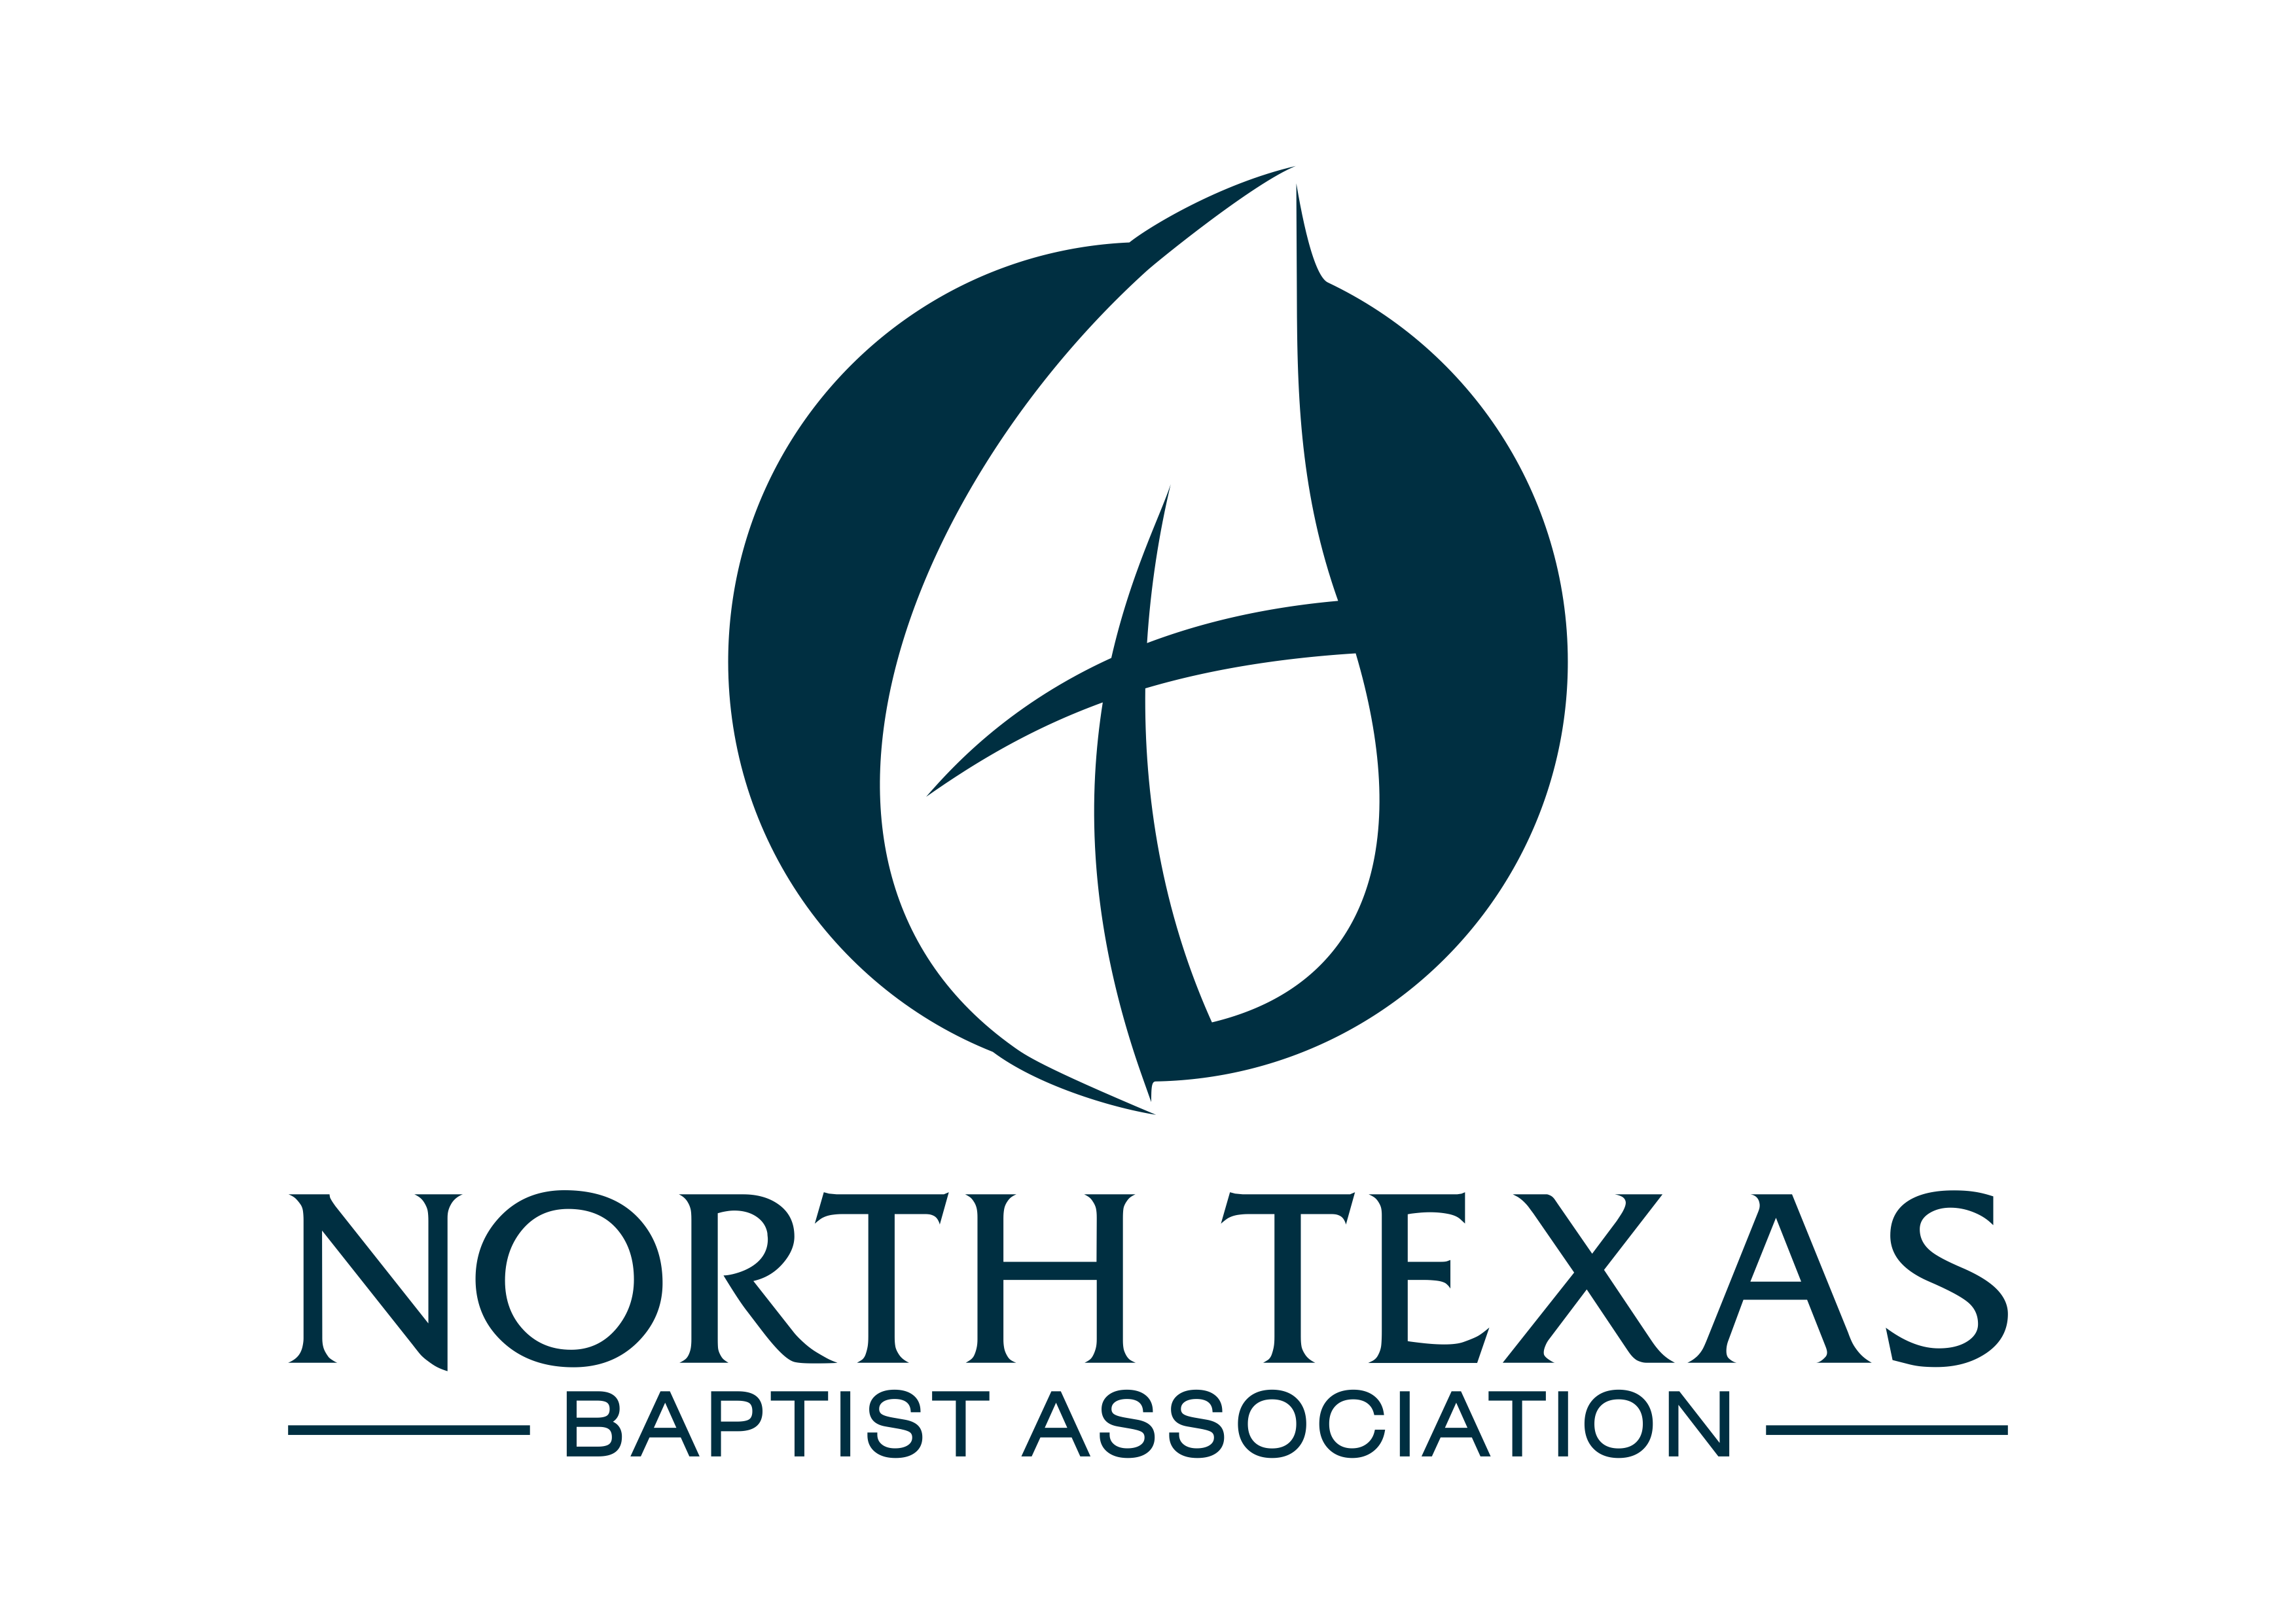 North Texas Baptist Association